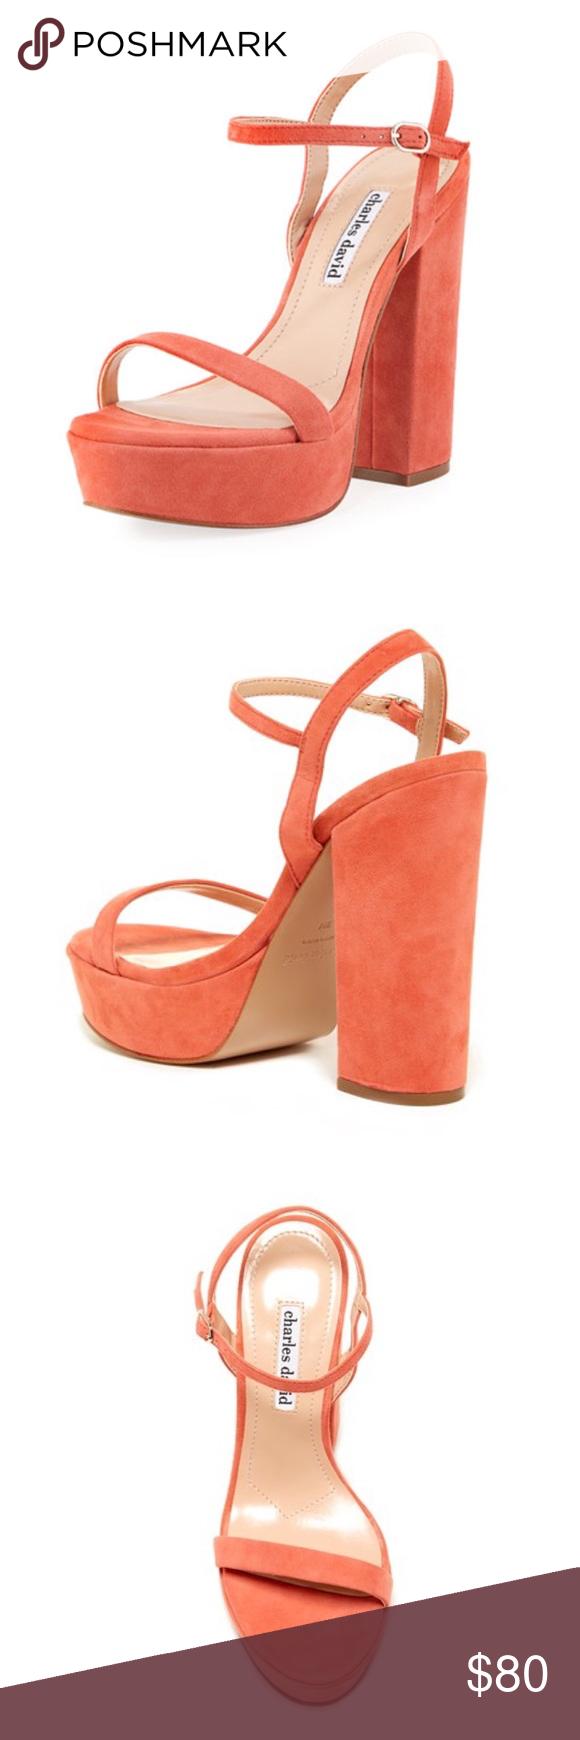 480259f119a3 NWT Charles David  Regal  Leather Platform Sandal High heel sandal. Leather  upper.